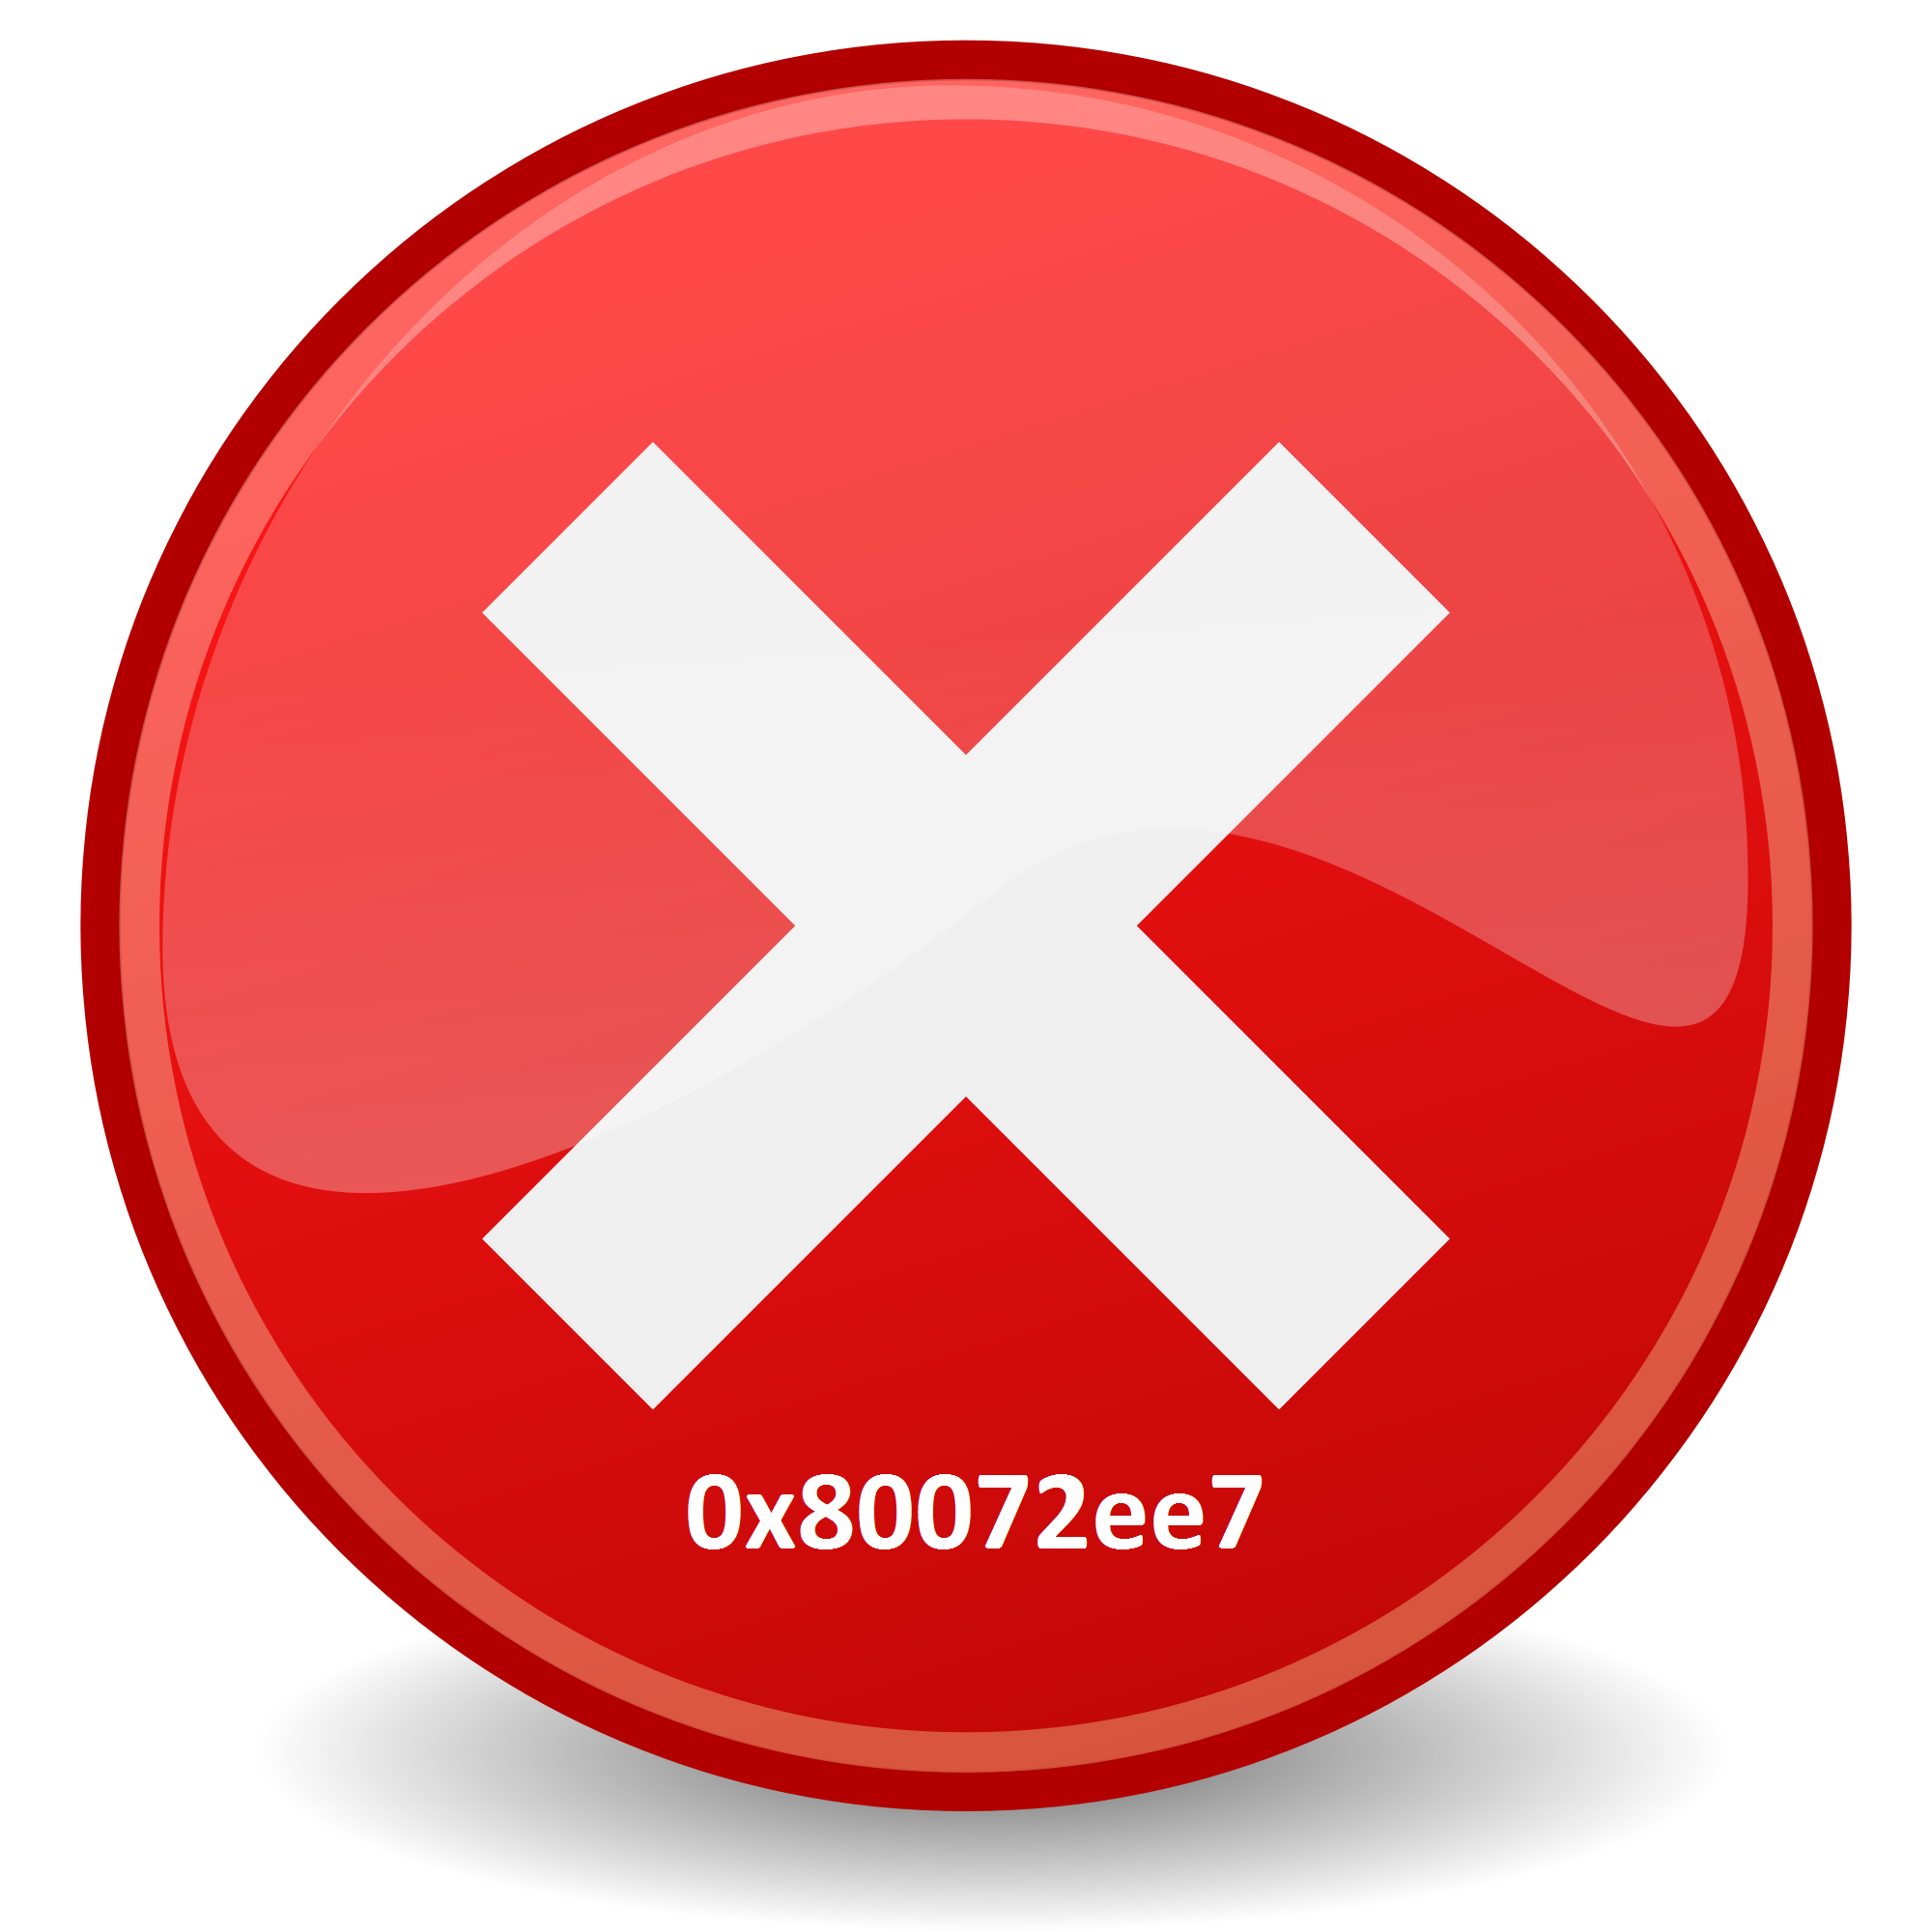 Windows 10 Fehler 0x80072ee7